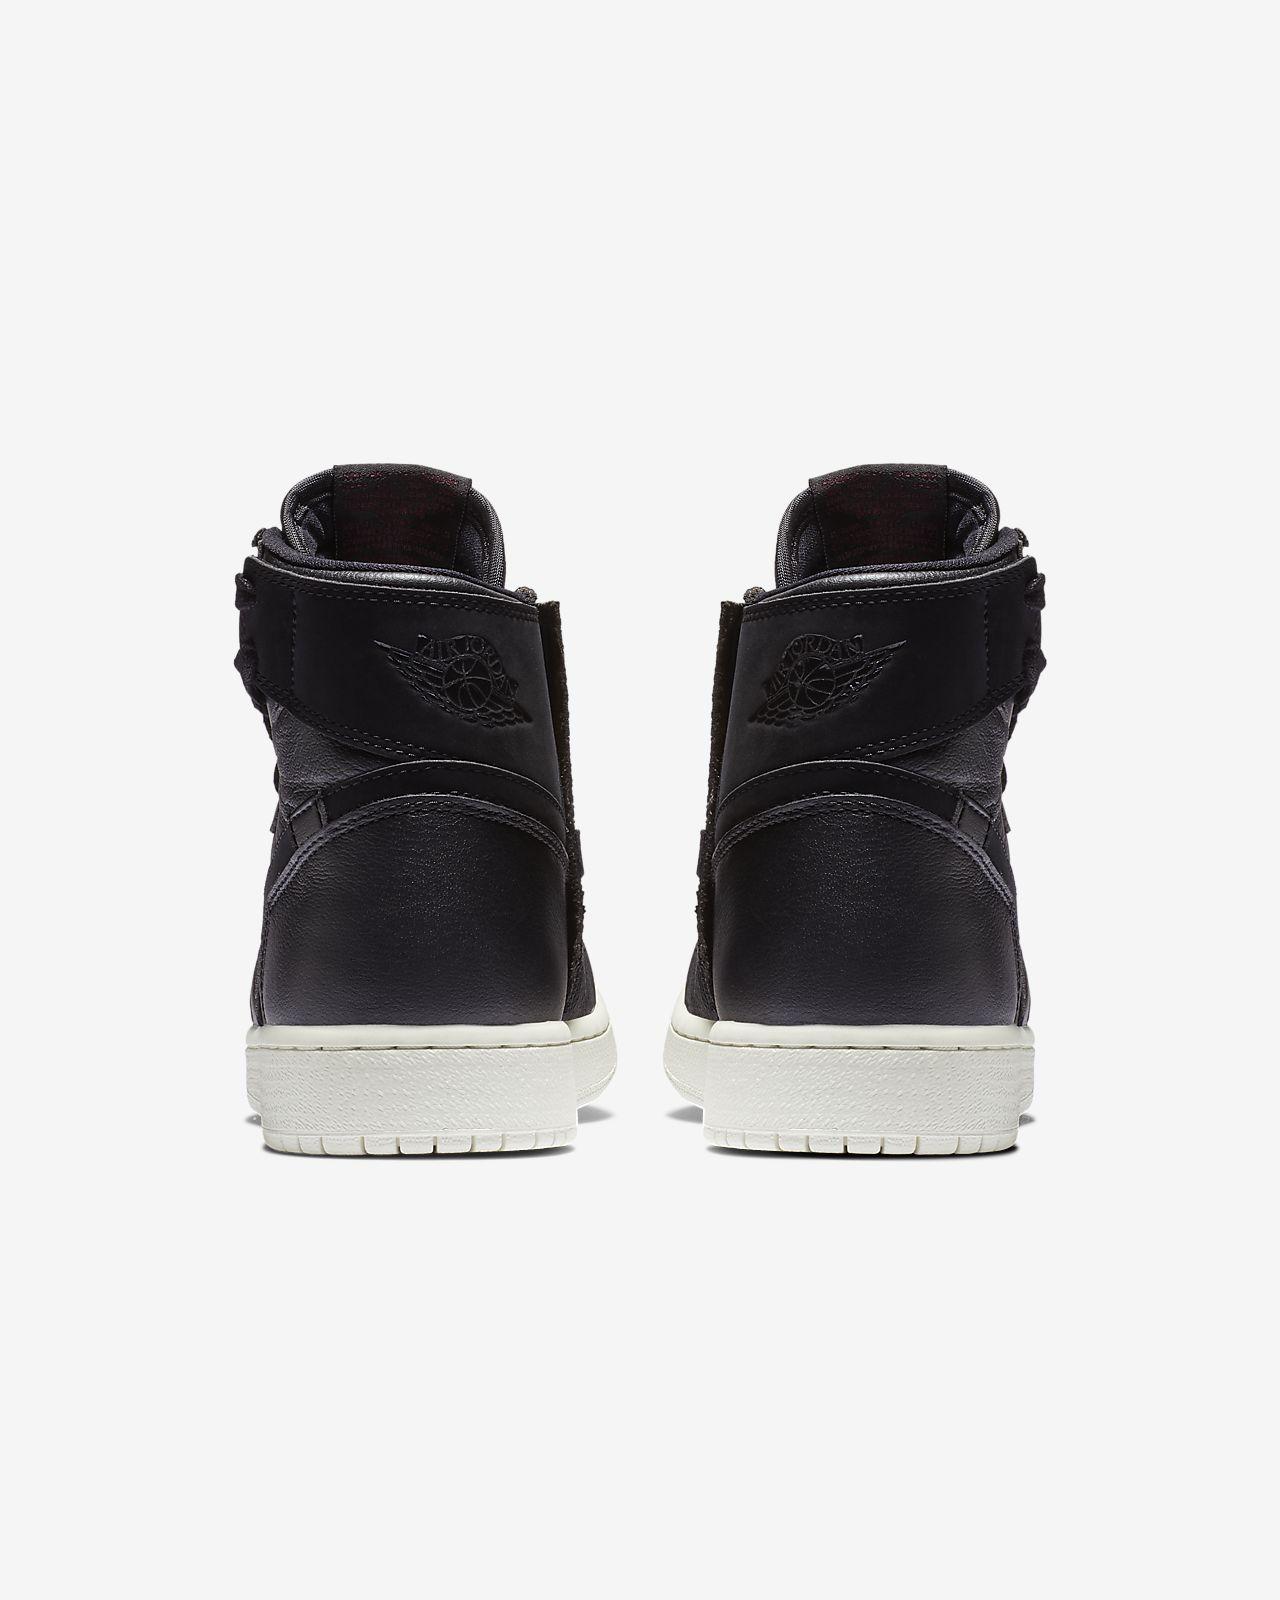 070cb71fc9e Air Jordan 1 Rebel XX Women s Shoe. Nike.com AU